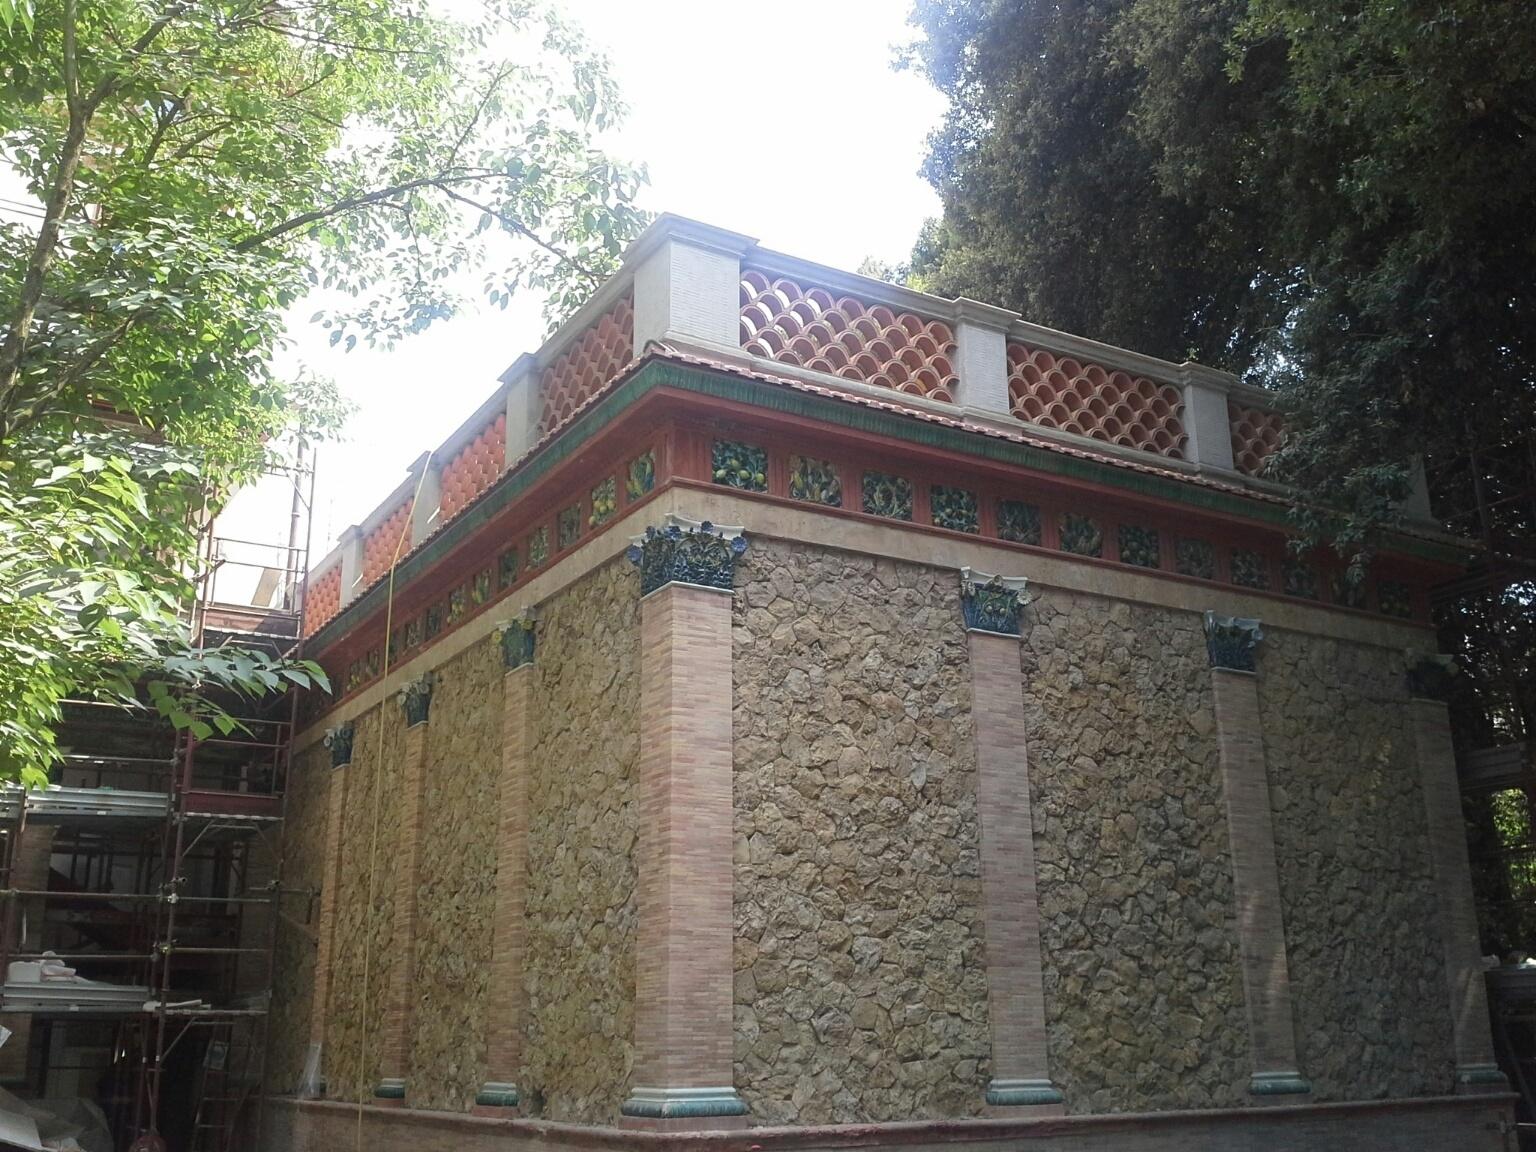 Frangisole in terracotta